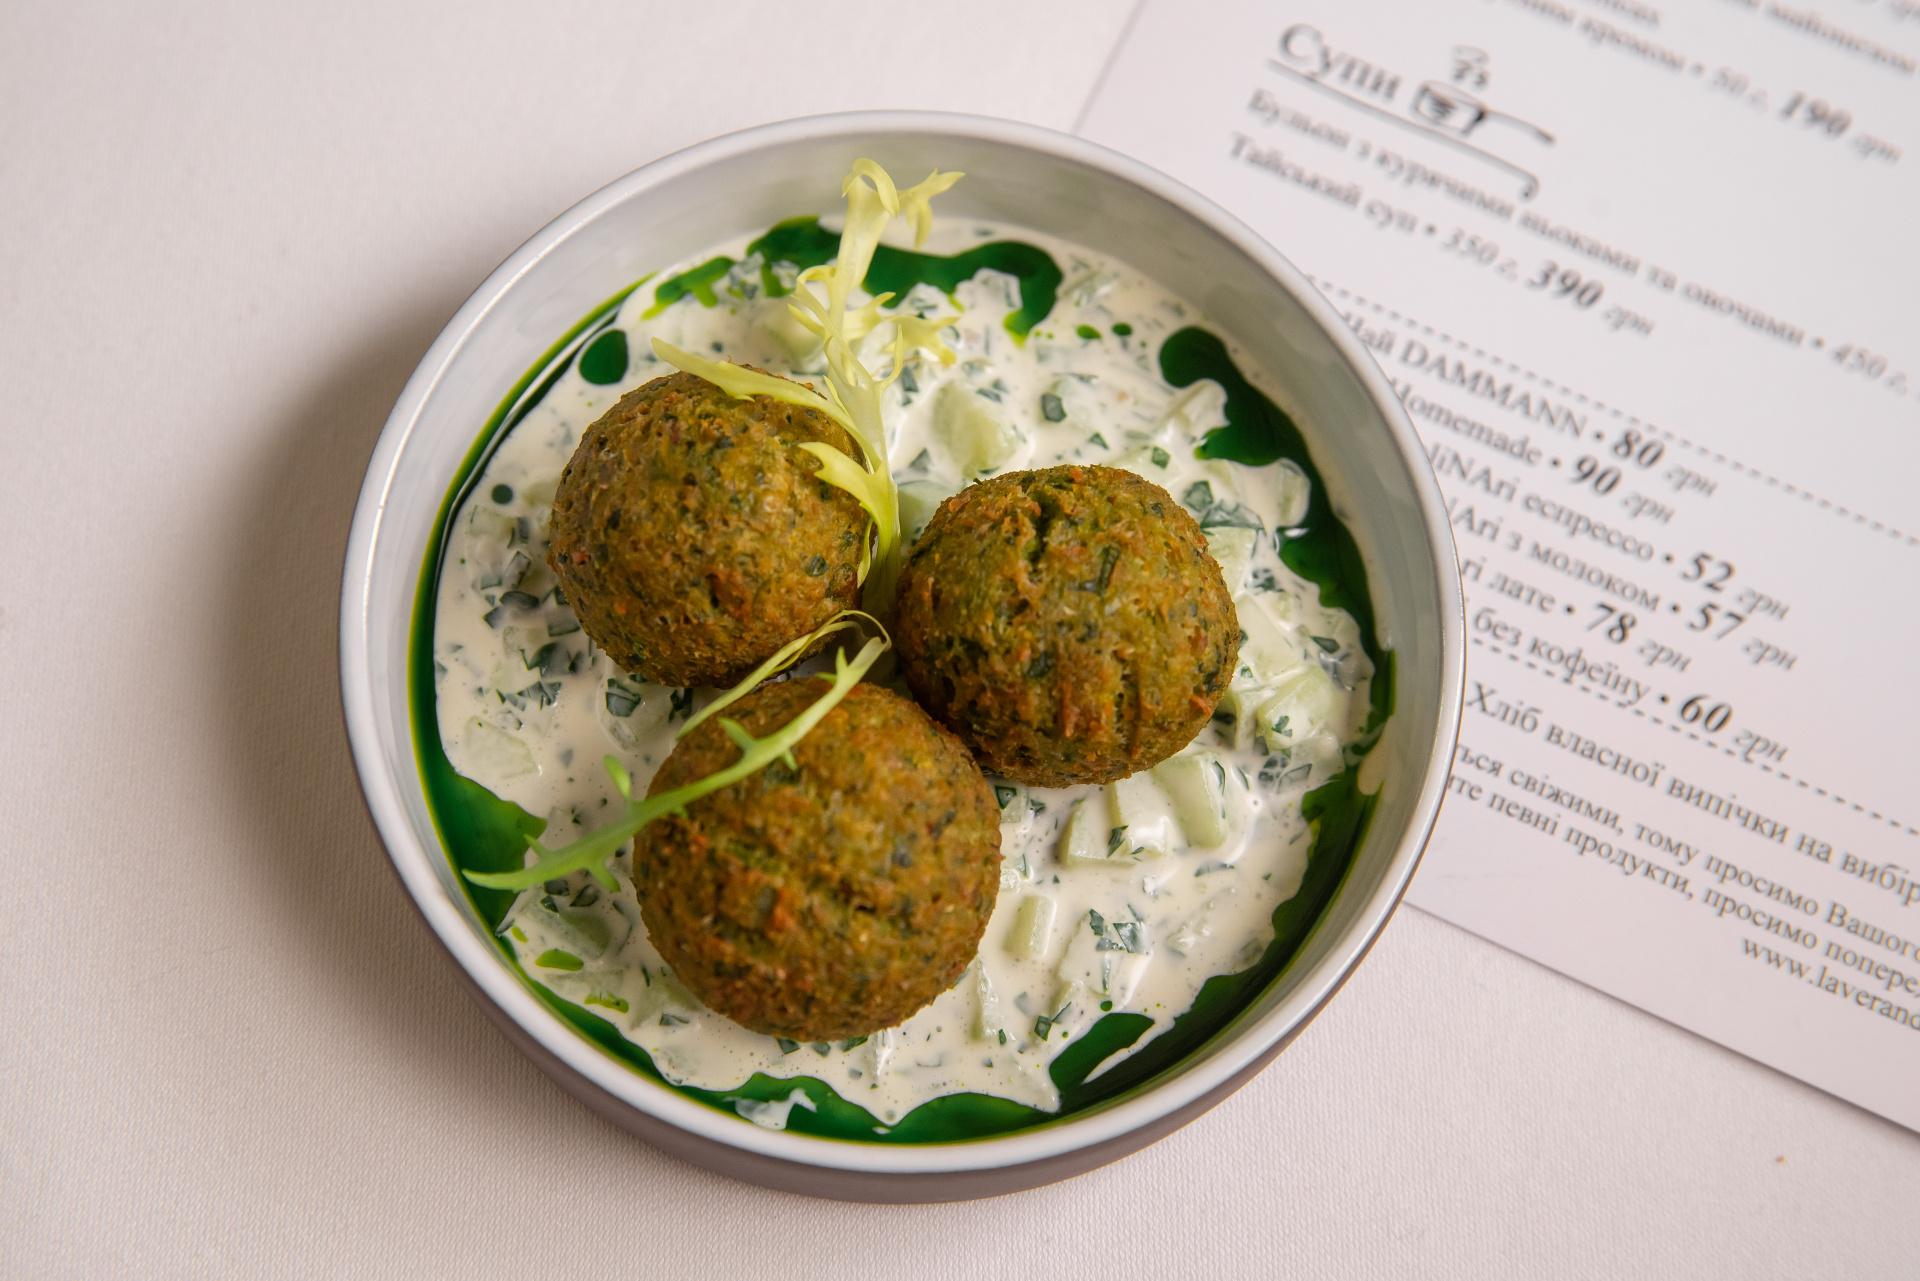 Falafel a zakysaná smetana s okurkou, mátou a tahini pastou